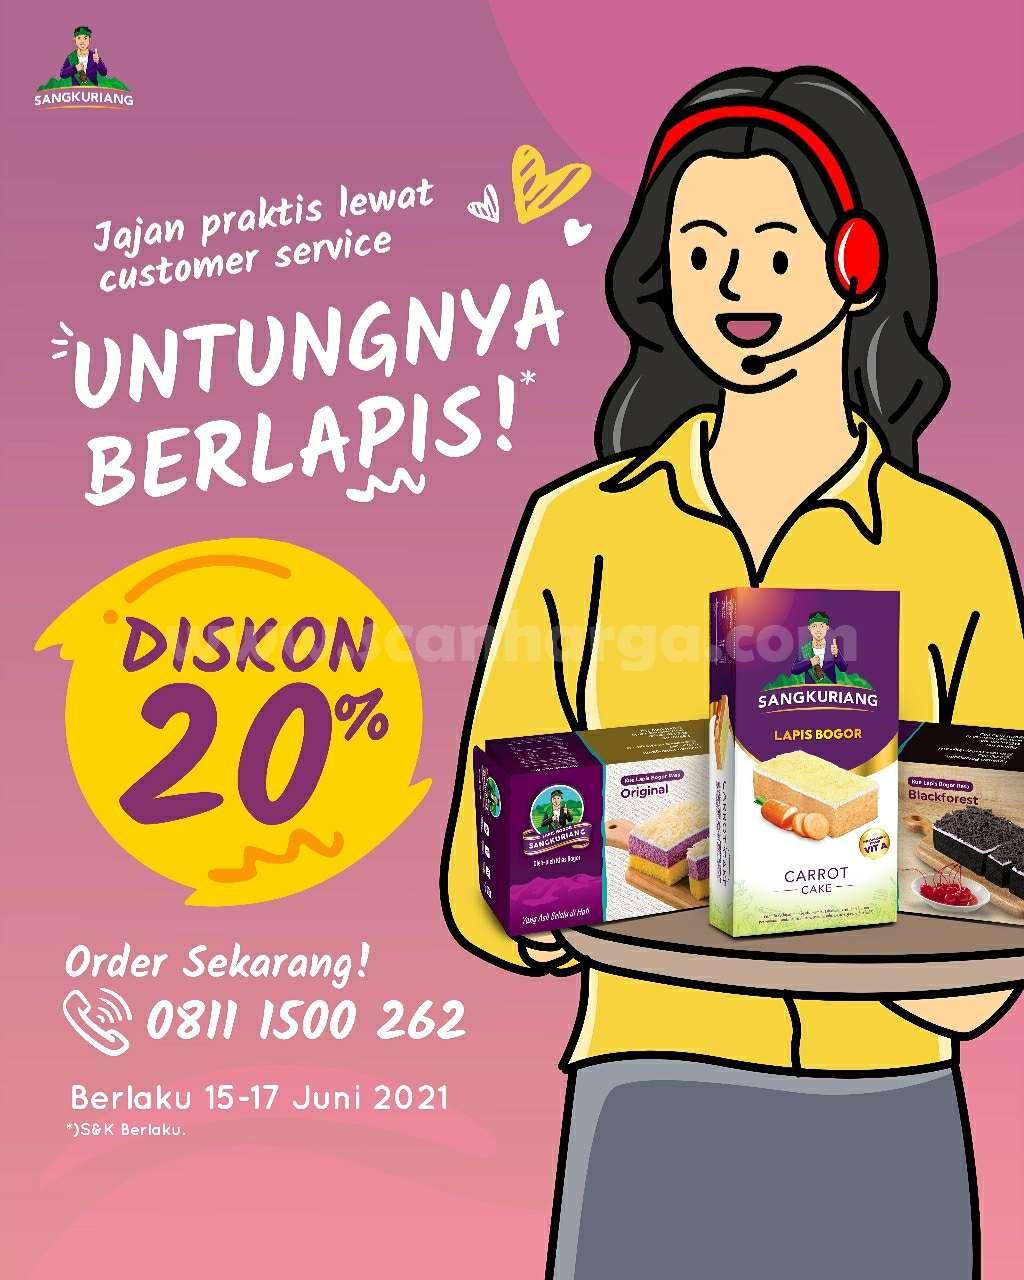 Promo Lapis Bogor Diskon 20% untuk Blackforest & Carrot Cake